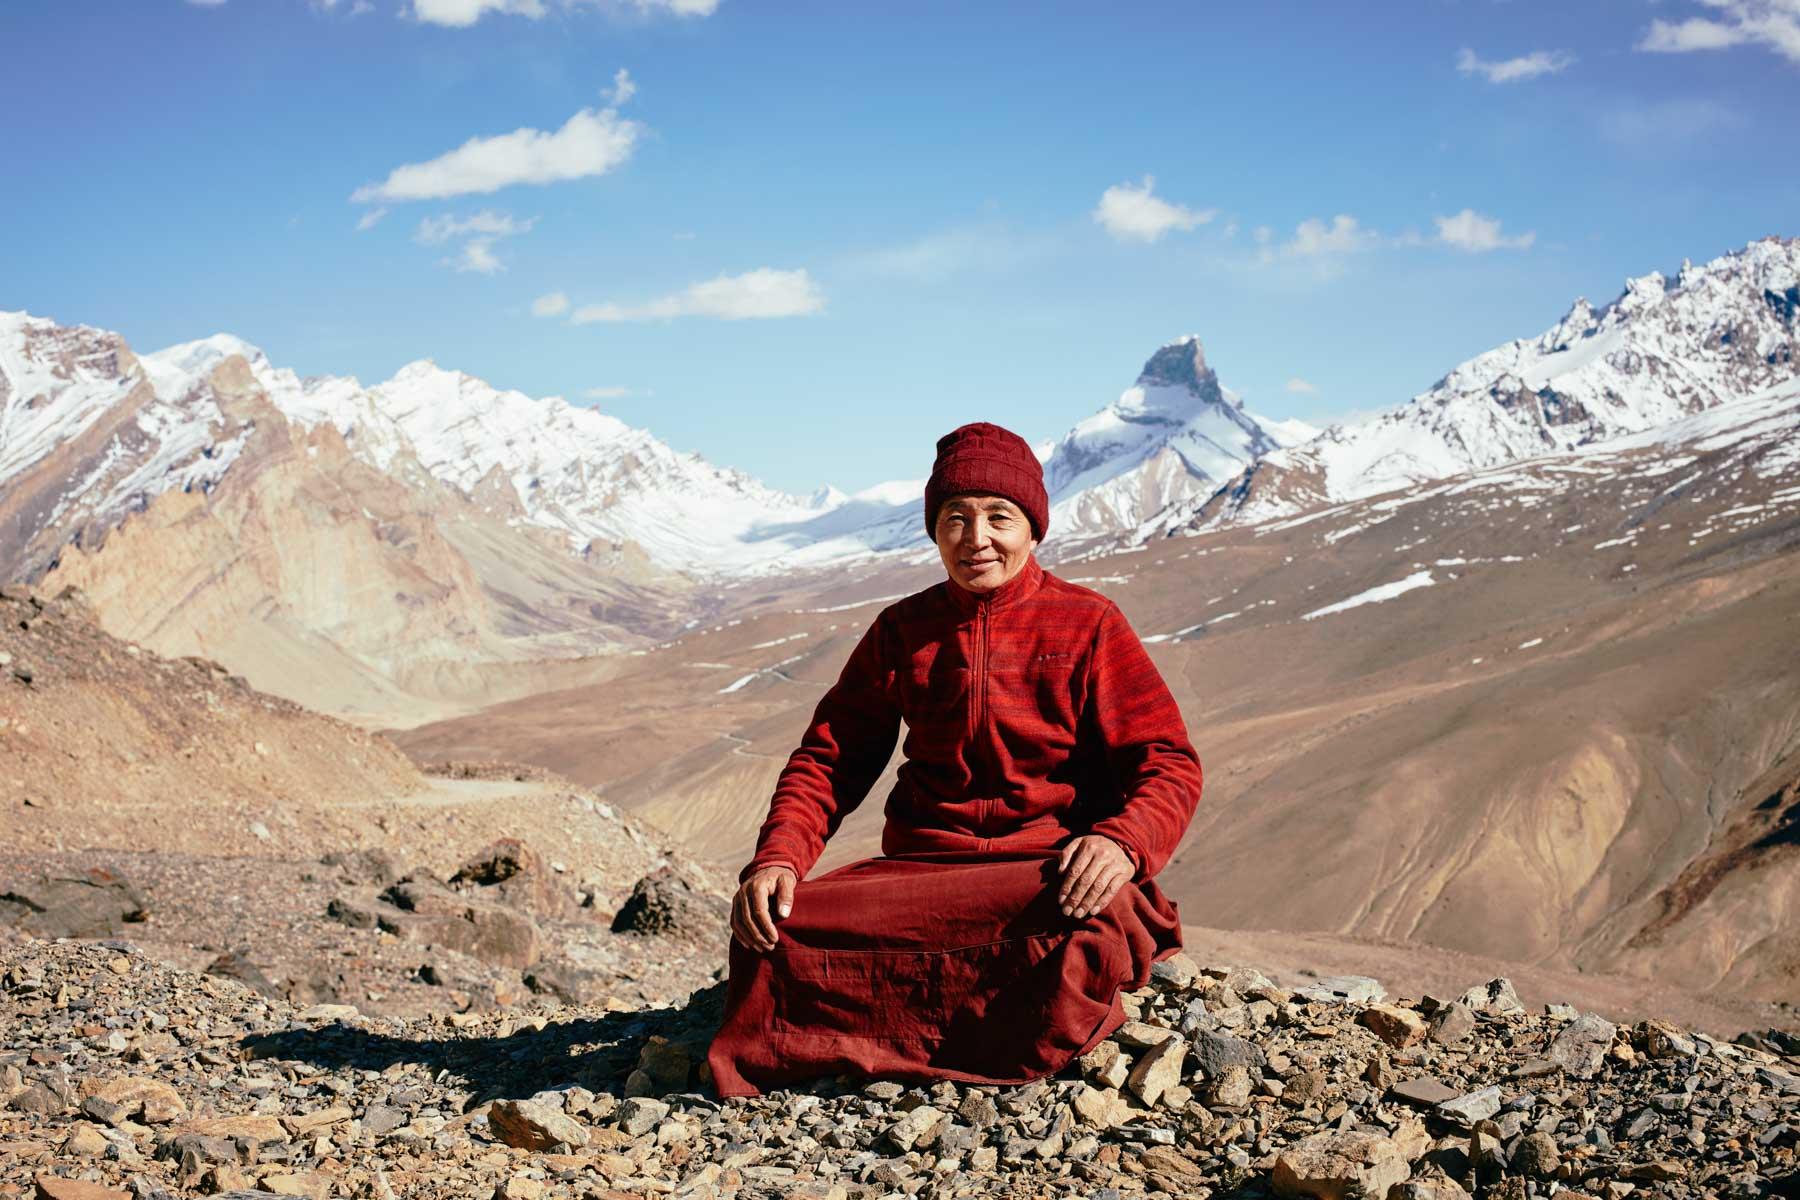 Lama Thsepel, kurz vor Photoksar/ Ladakh/ Indien, 2018